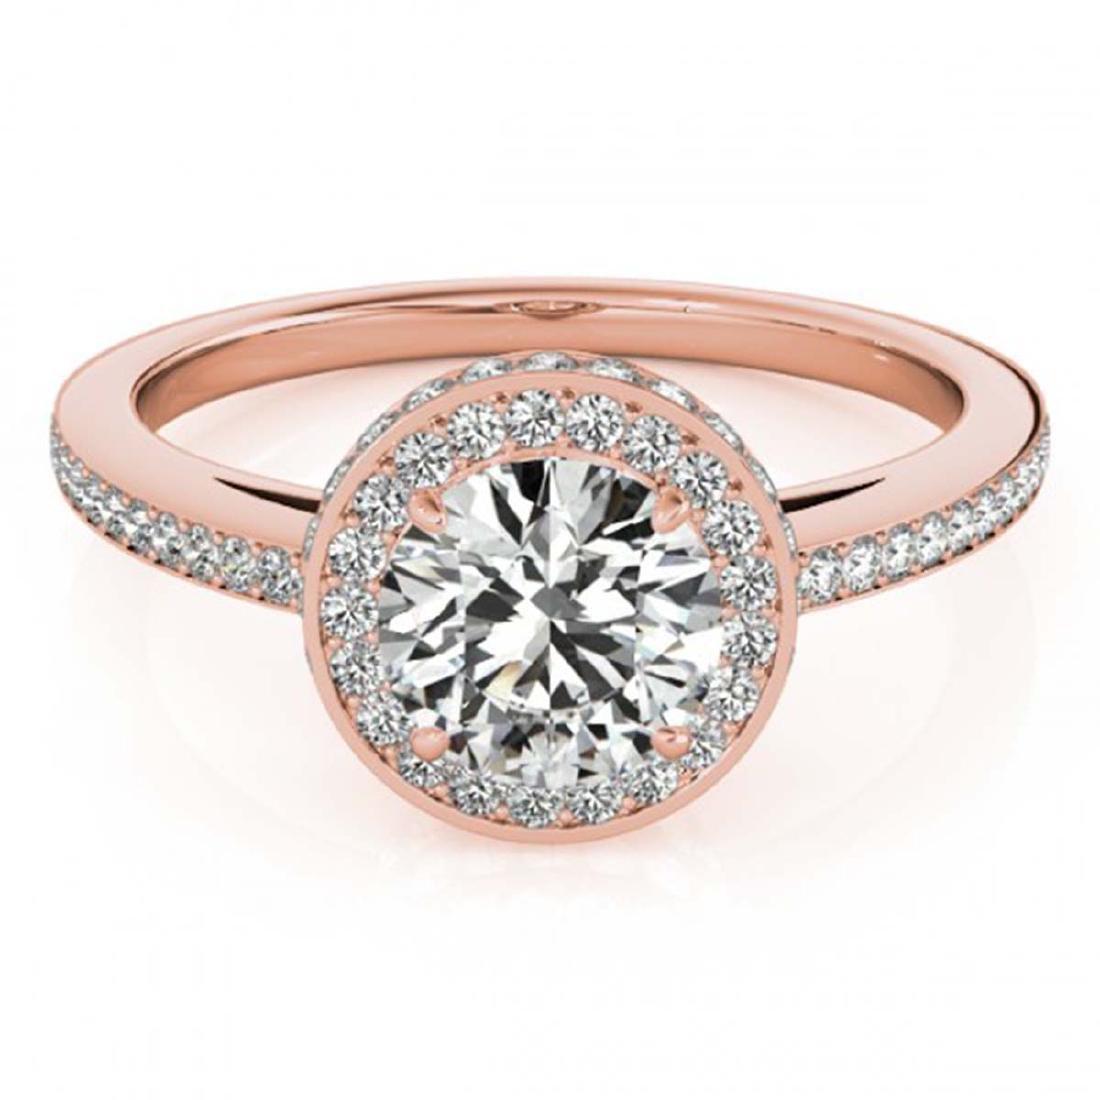 1.25 ctw VS/SI Diamond Solitaire Halo Ring 14K Rose